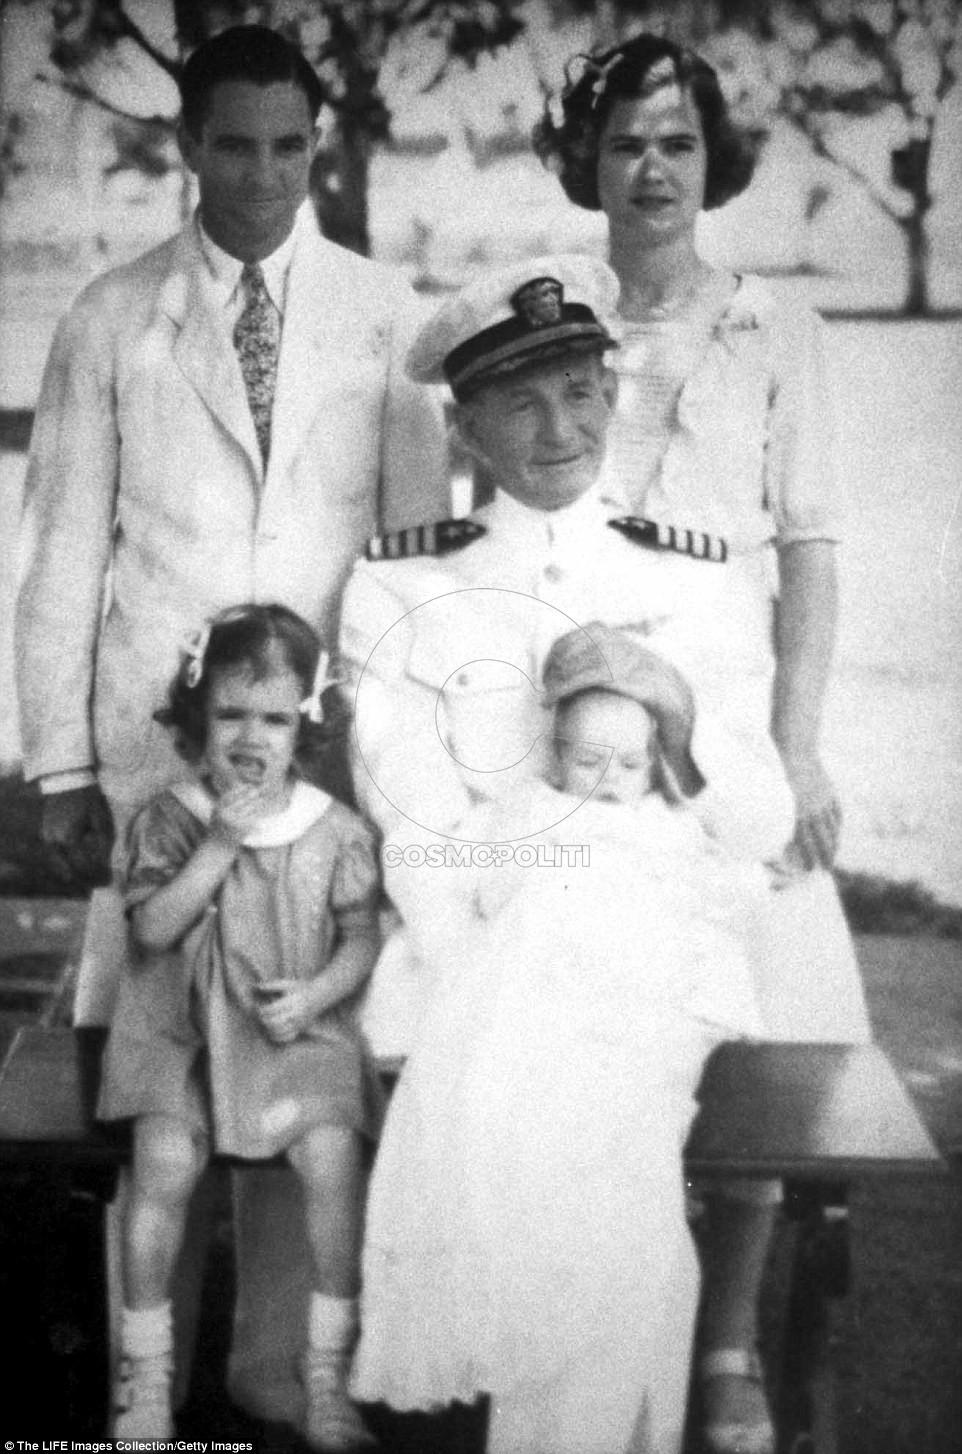 4F69922A00000578-6099389-Circa_1936_Senator_John_S_McCain_III_poses_for_a_family_portrait-m-51_1535299506835